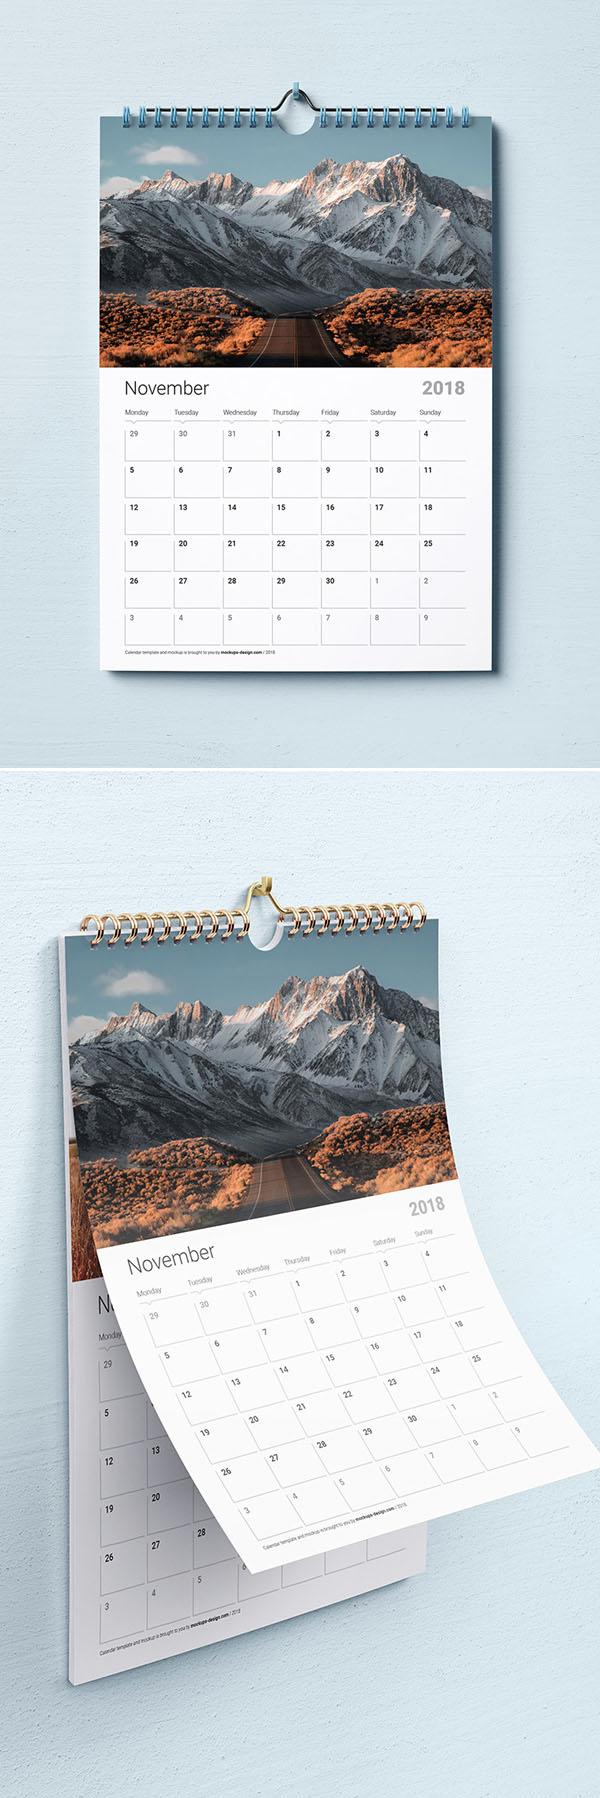 35 New Useful Free Psd Mockup Templates In 2020 Mockup Free Psd Free Psd Mockups Templates Calendar Design